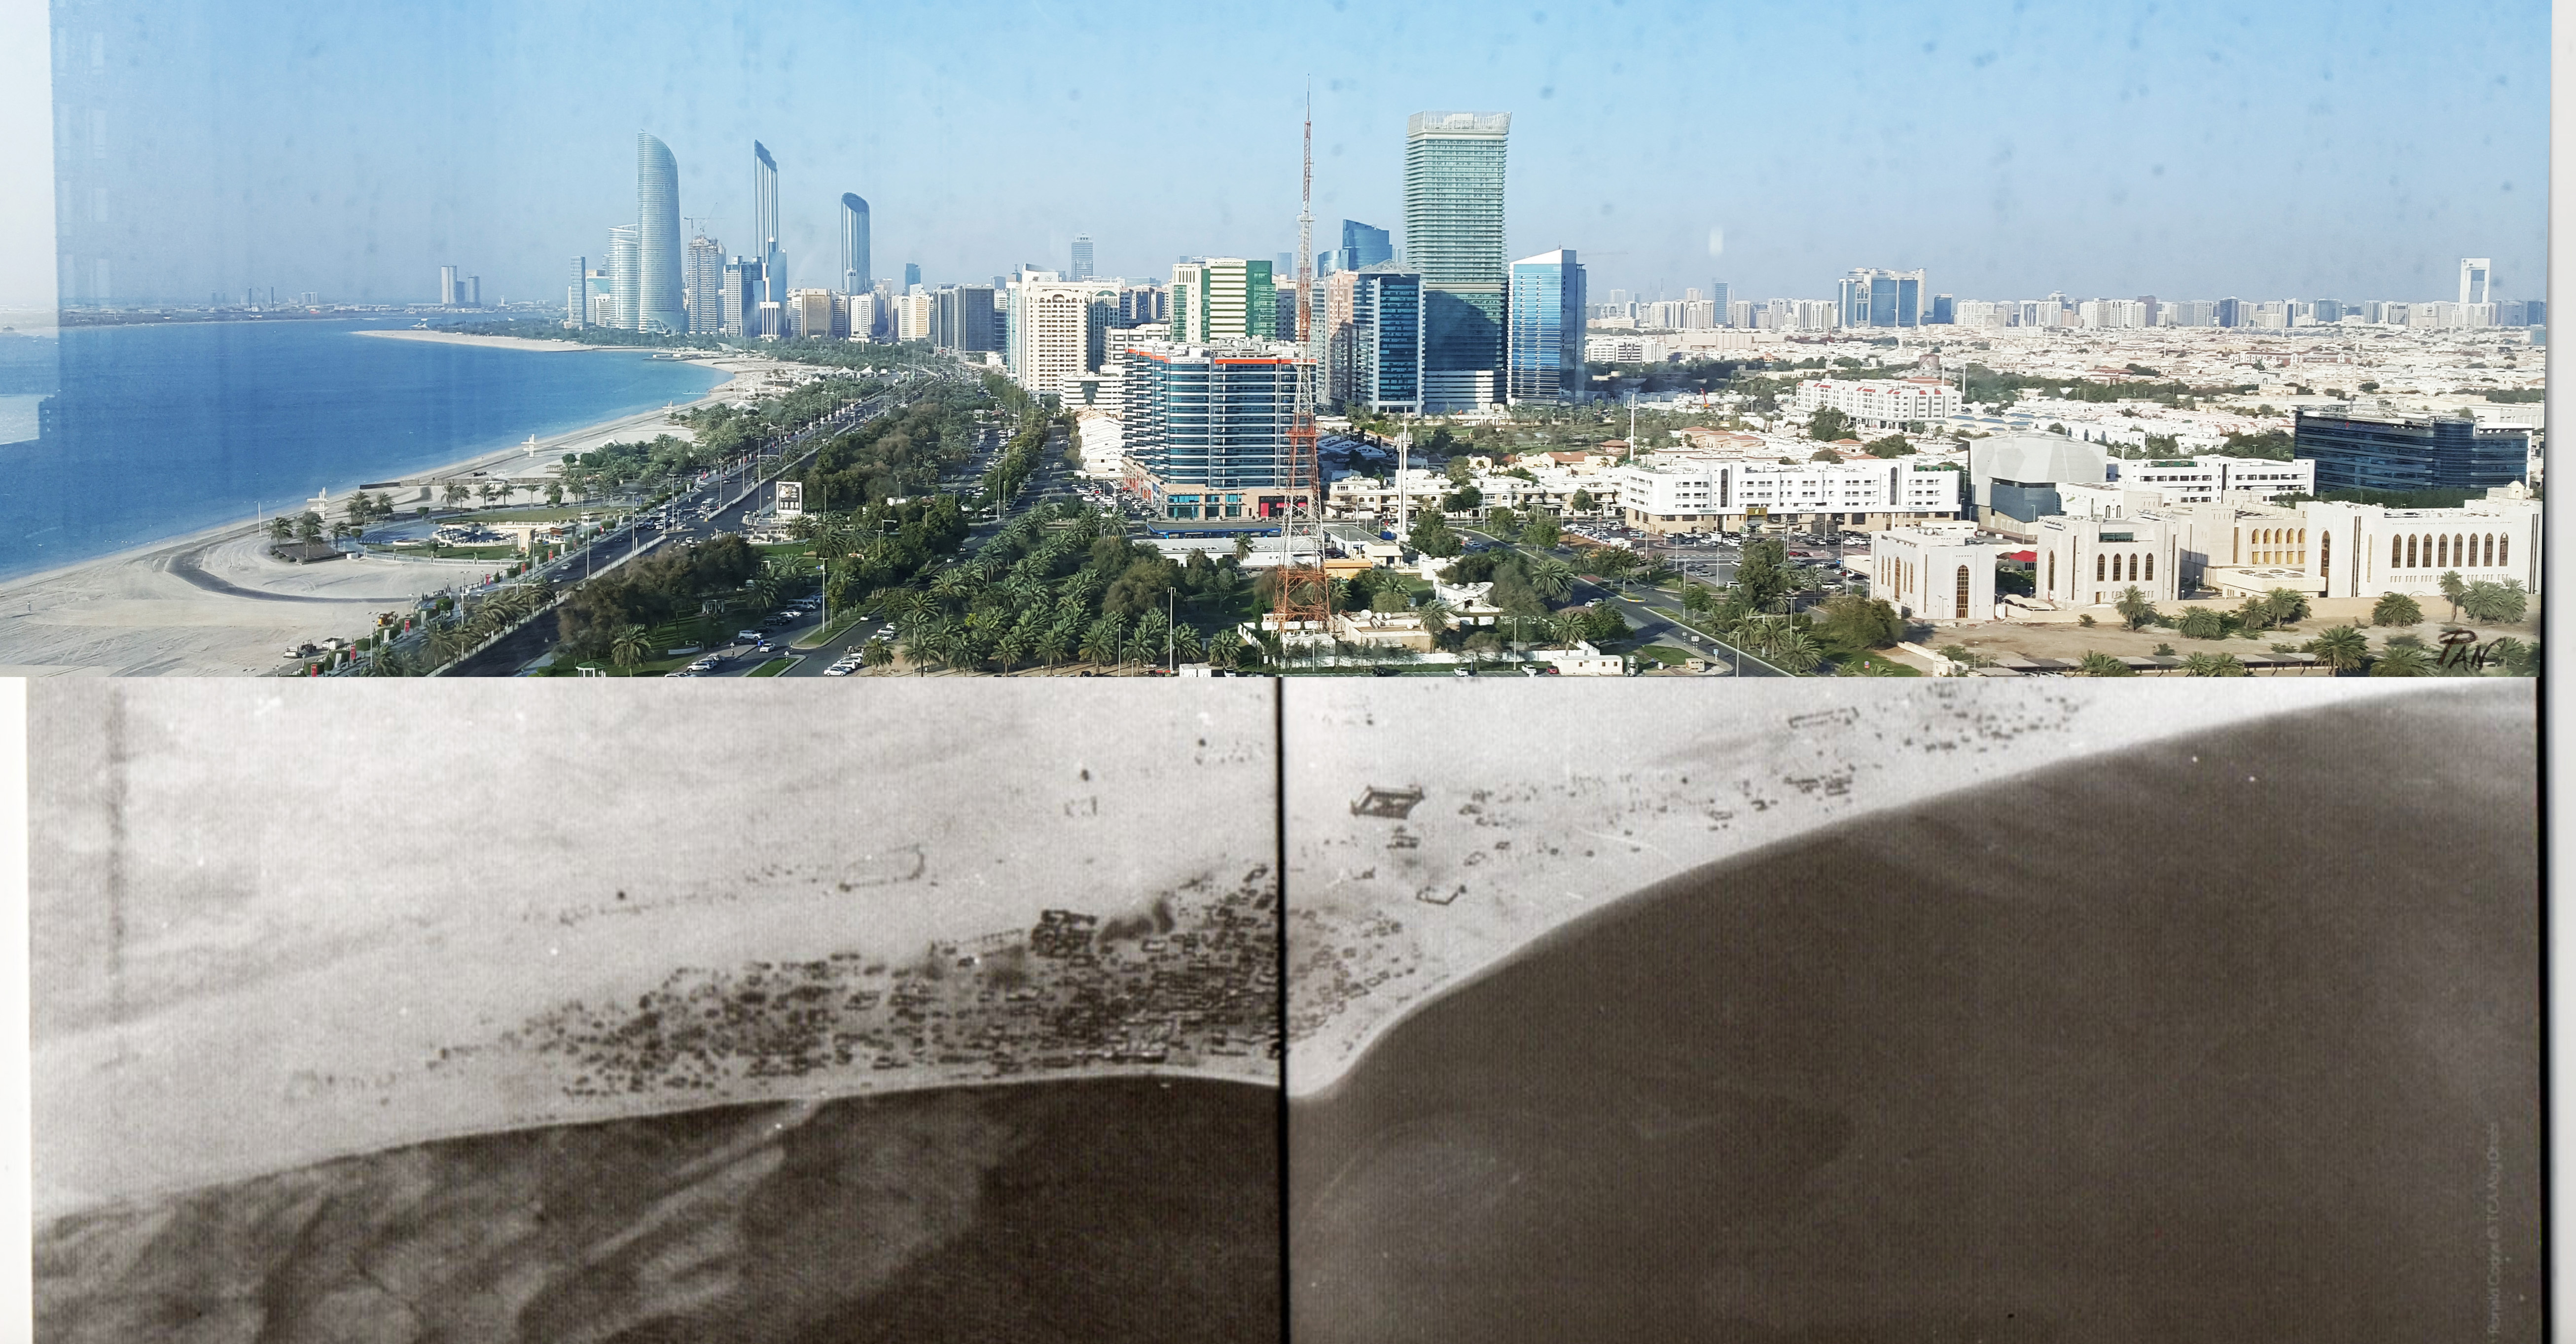 Abu Dhabi, Emirati Arabi, ph. Panaiotis Kruklidis